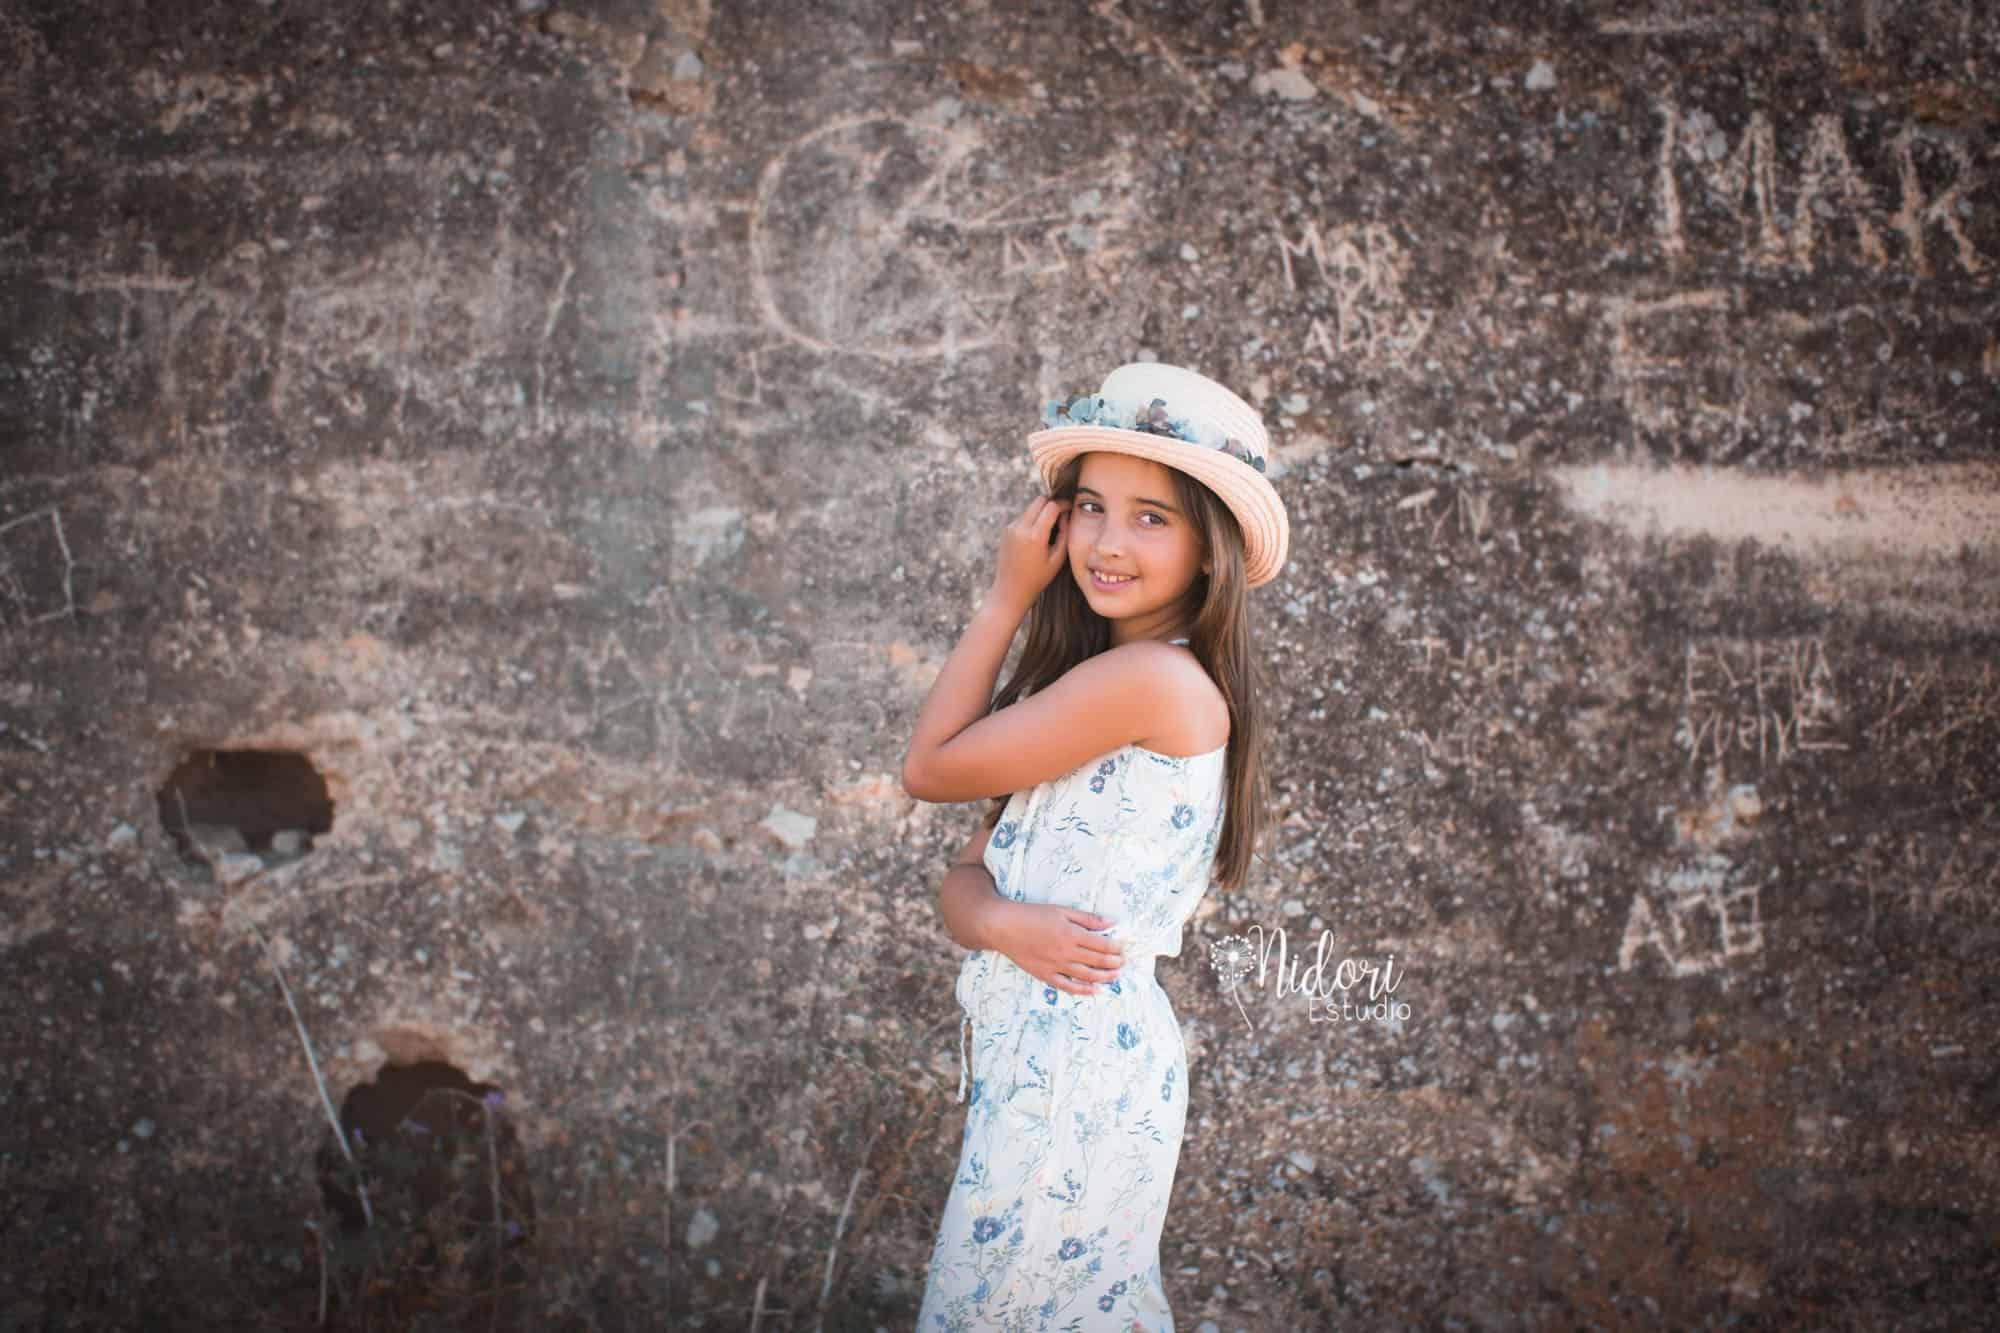 niños-infantiles-sesion-infantil-fotografia-nidoriestudio-fotos-valencia-almazora-castellon-españa-spain-01